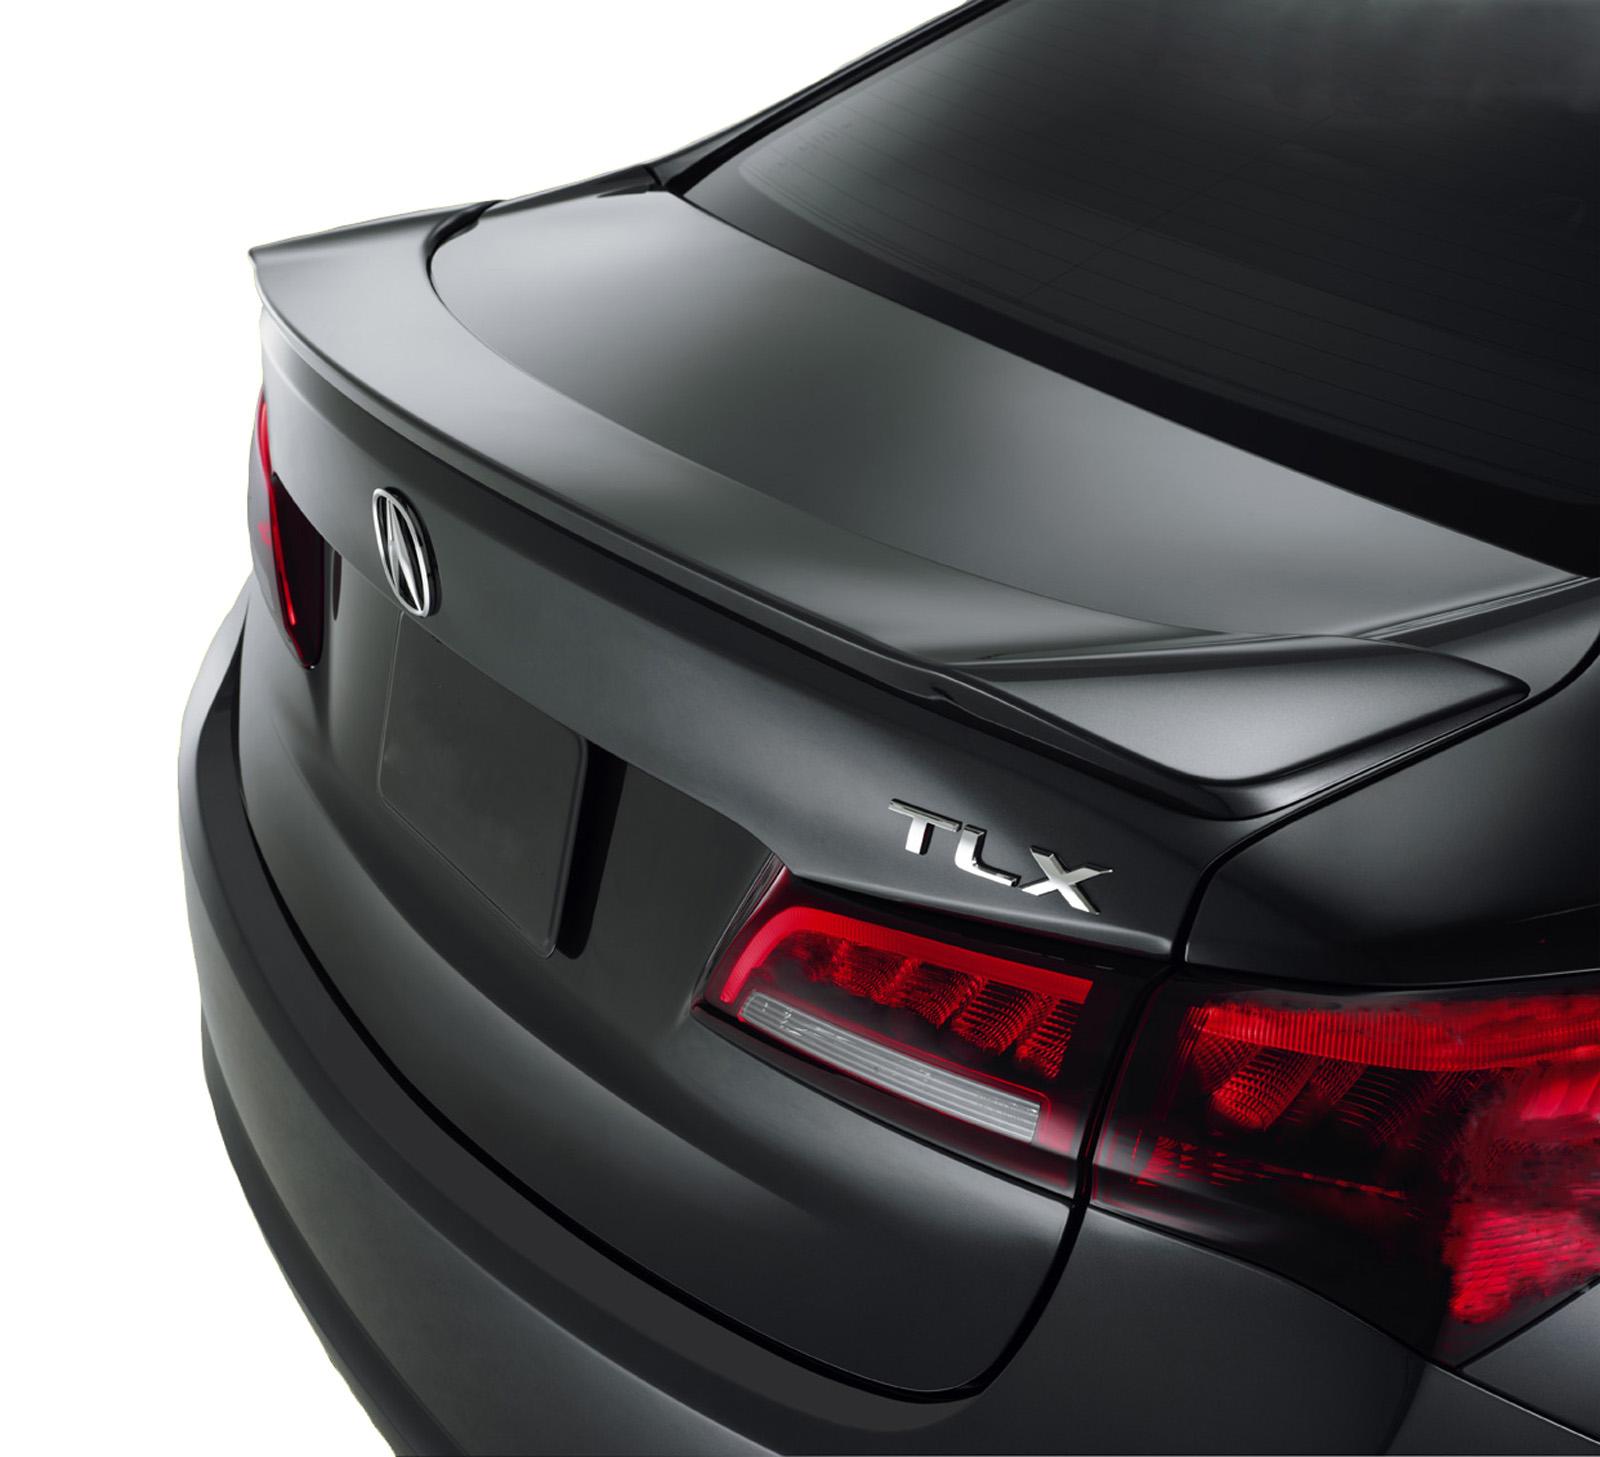 Acura TLX Flushmount Factory Style Spoiler 2015-2018